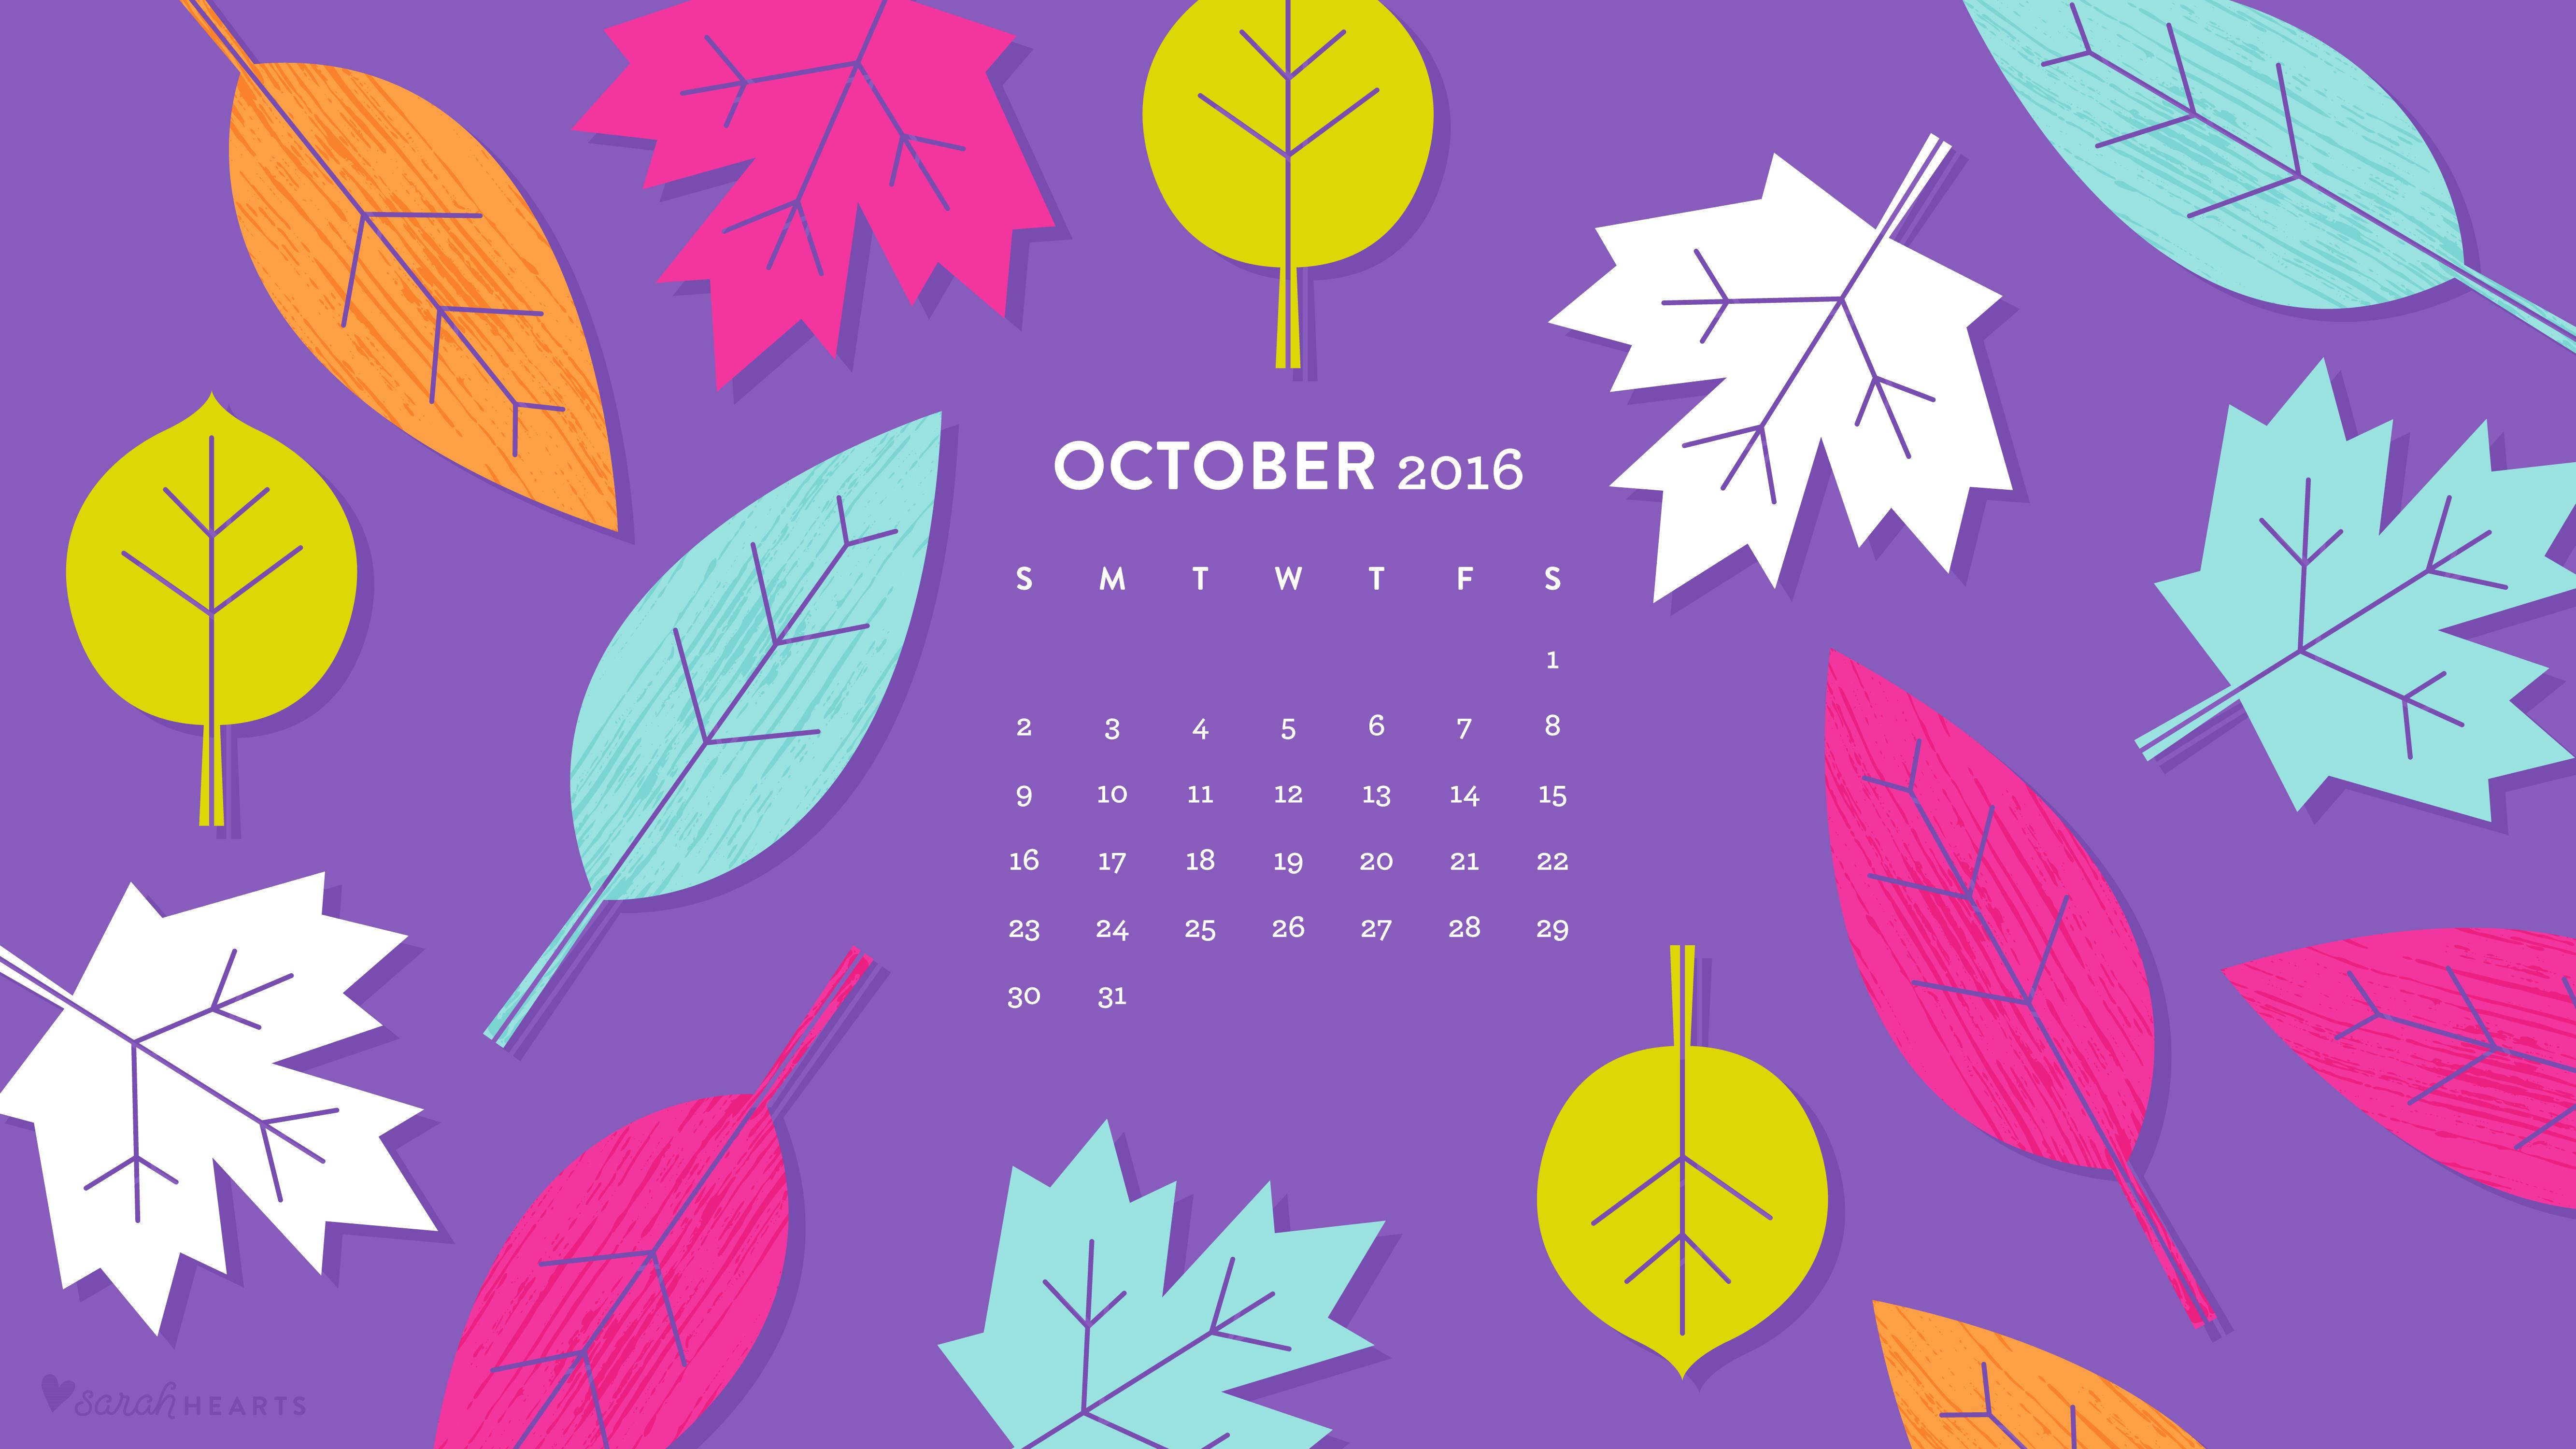 Fall Wallpaper For Computer Screen October 2016 Fall Leaves Calendar Wallpapers Sarah Hearts